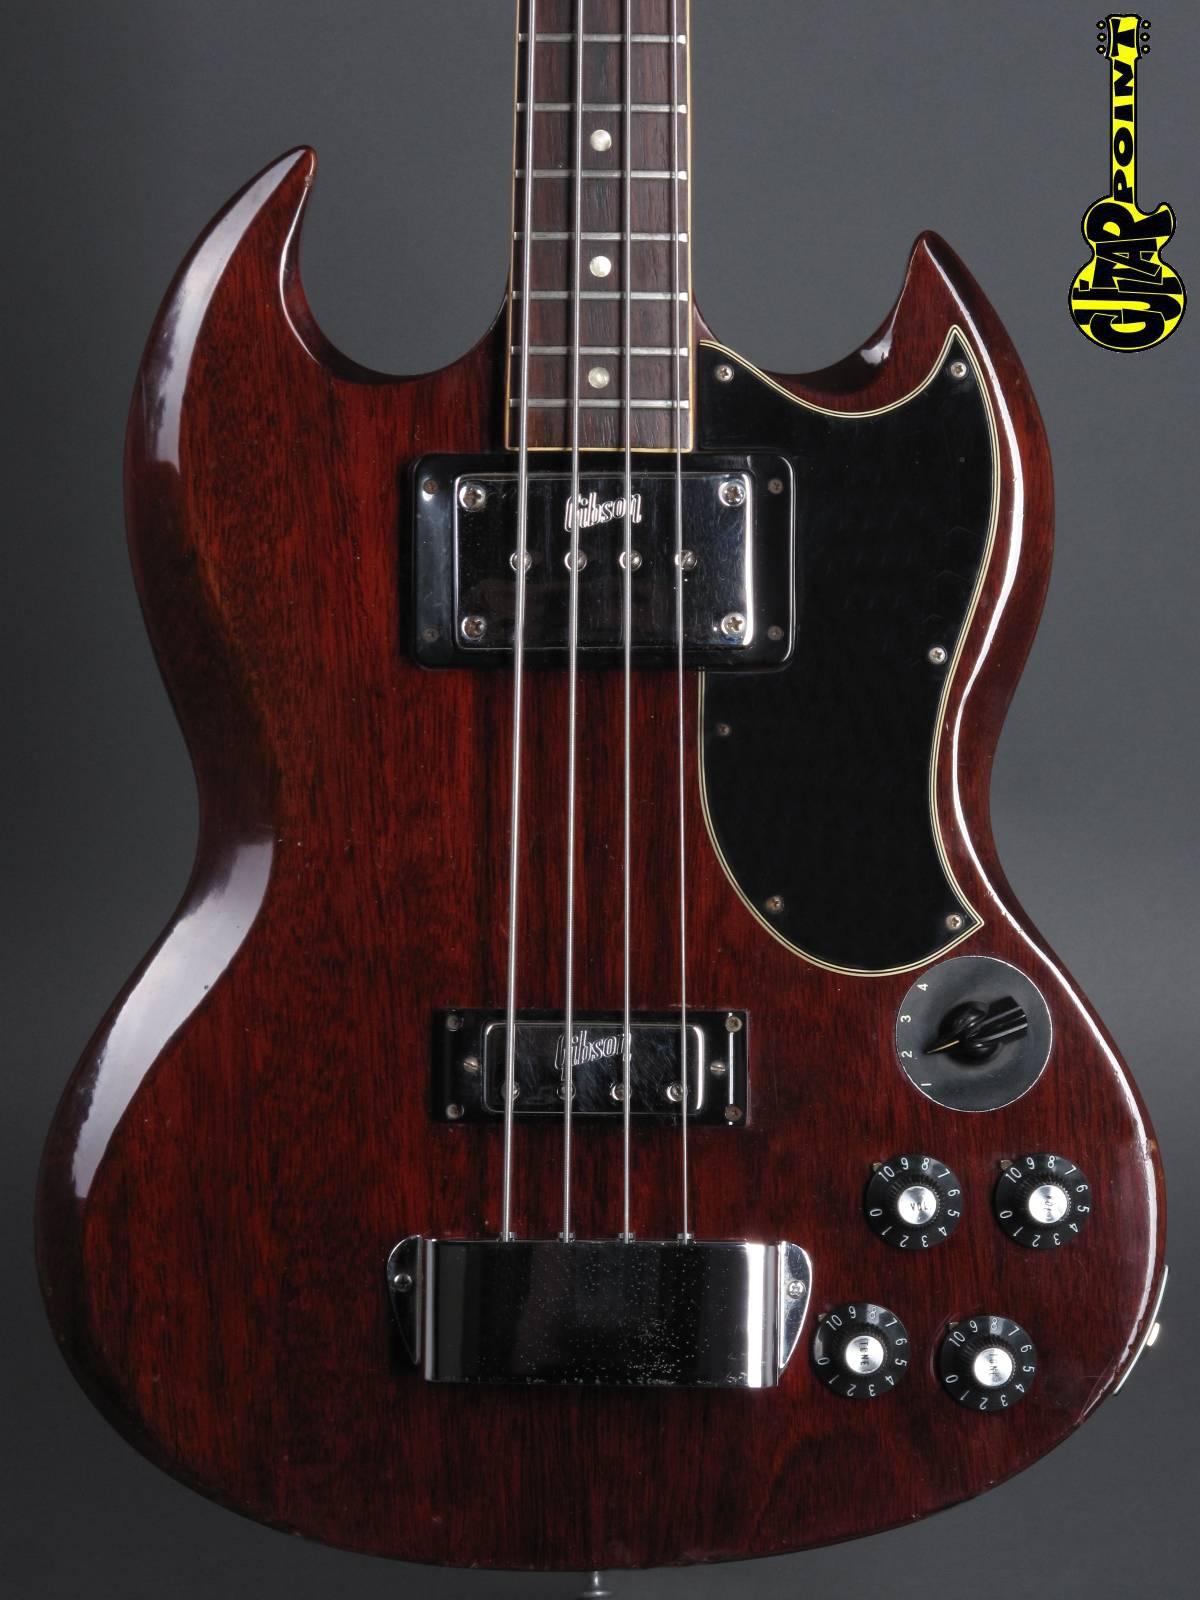 1972 Gibson EB-3 Bass - Cherry (open headstock!)